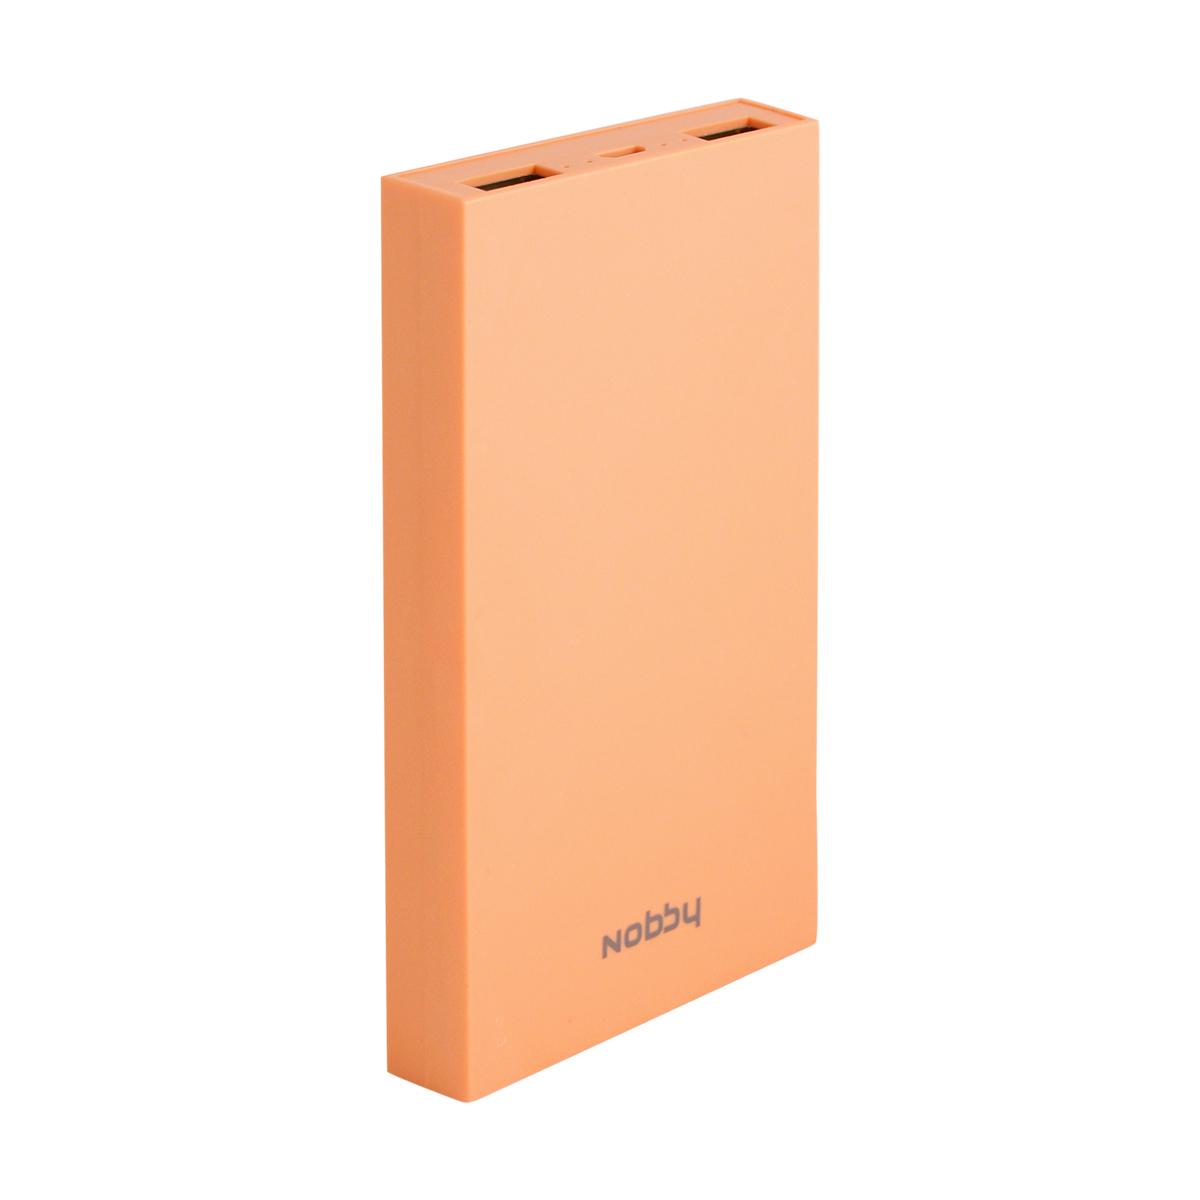 Nobby Practic 029-001, Peach внешний аккумулятор (8000 мАч) nobby nobby pb 006 4000 мач